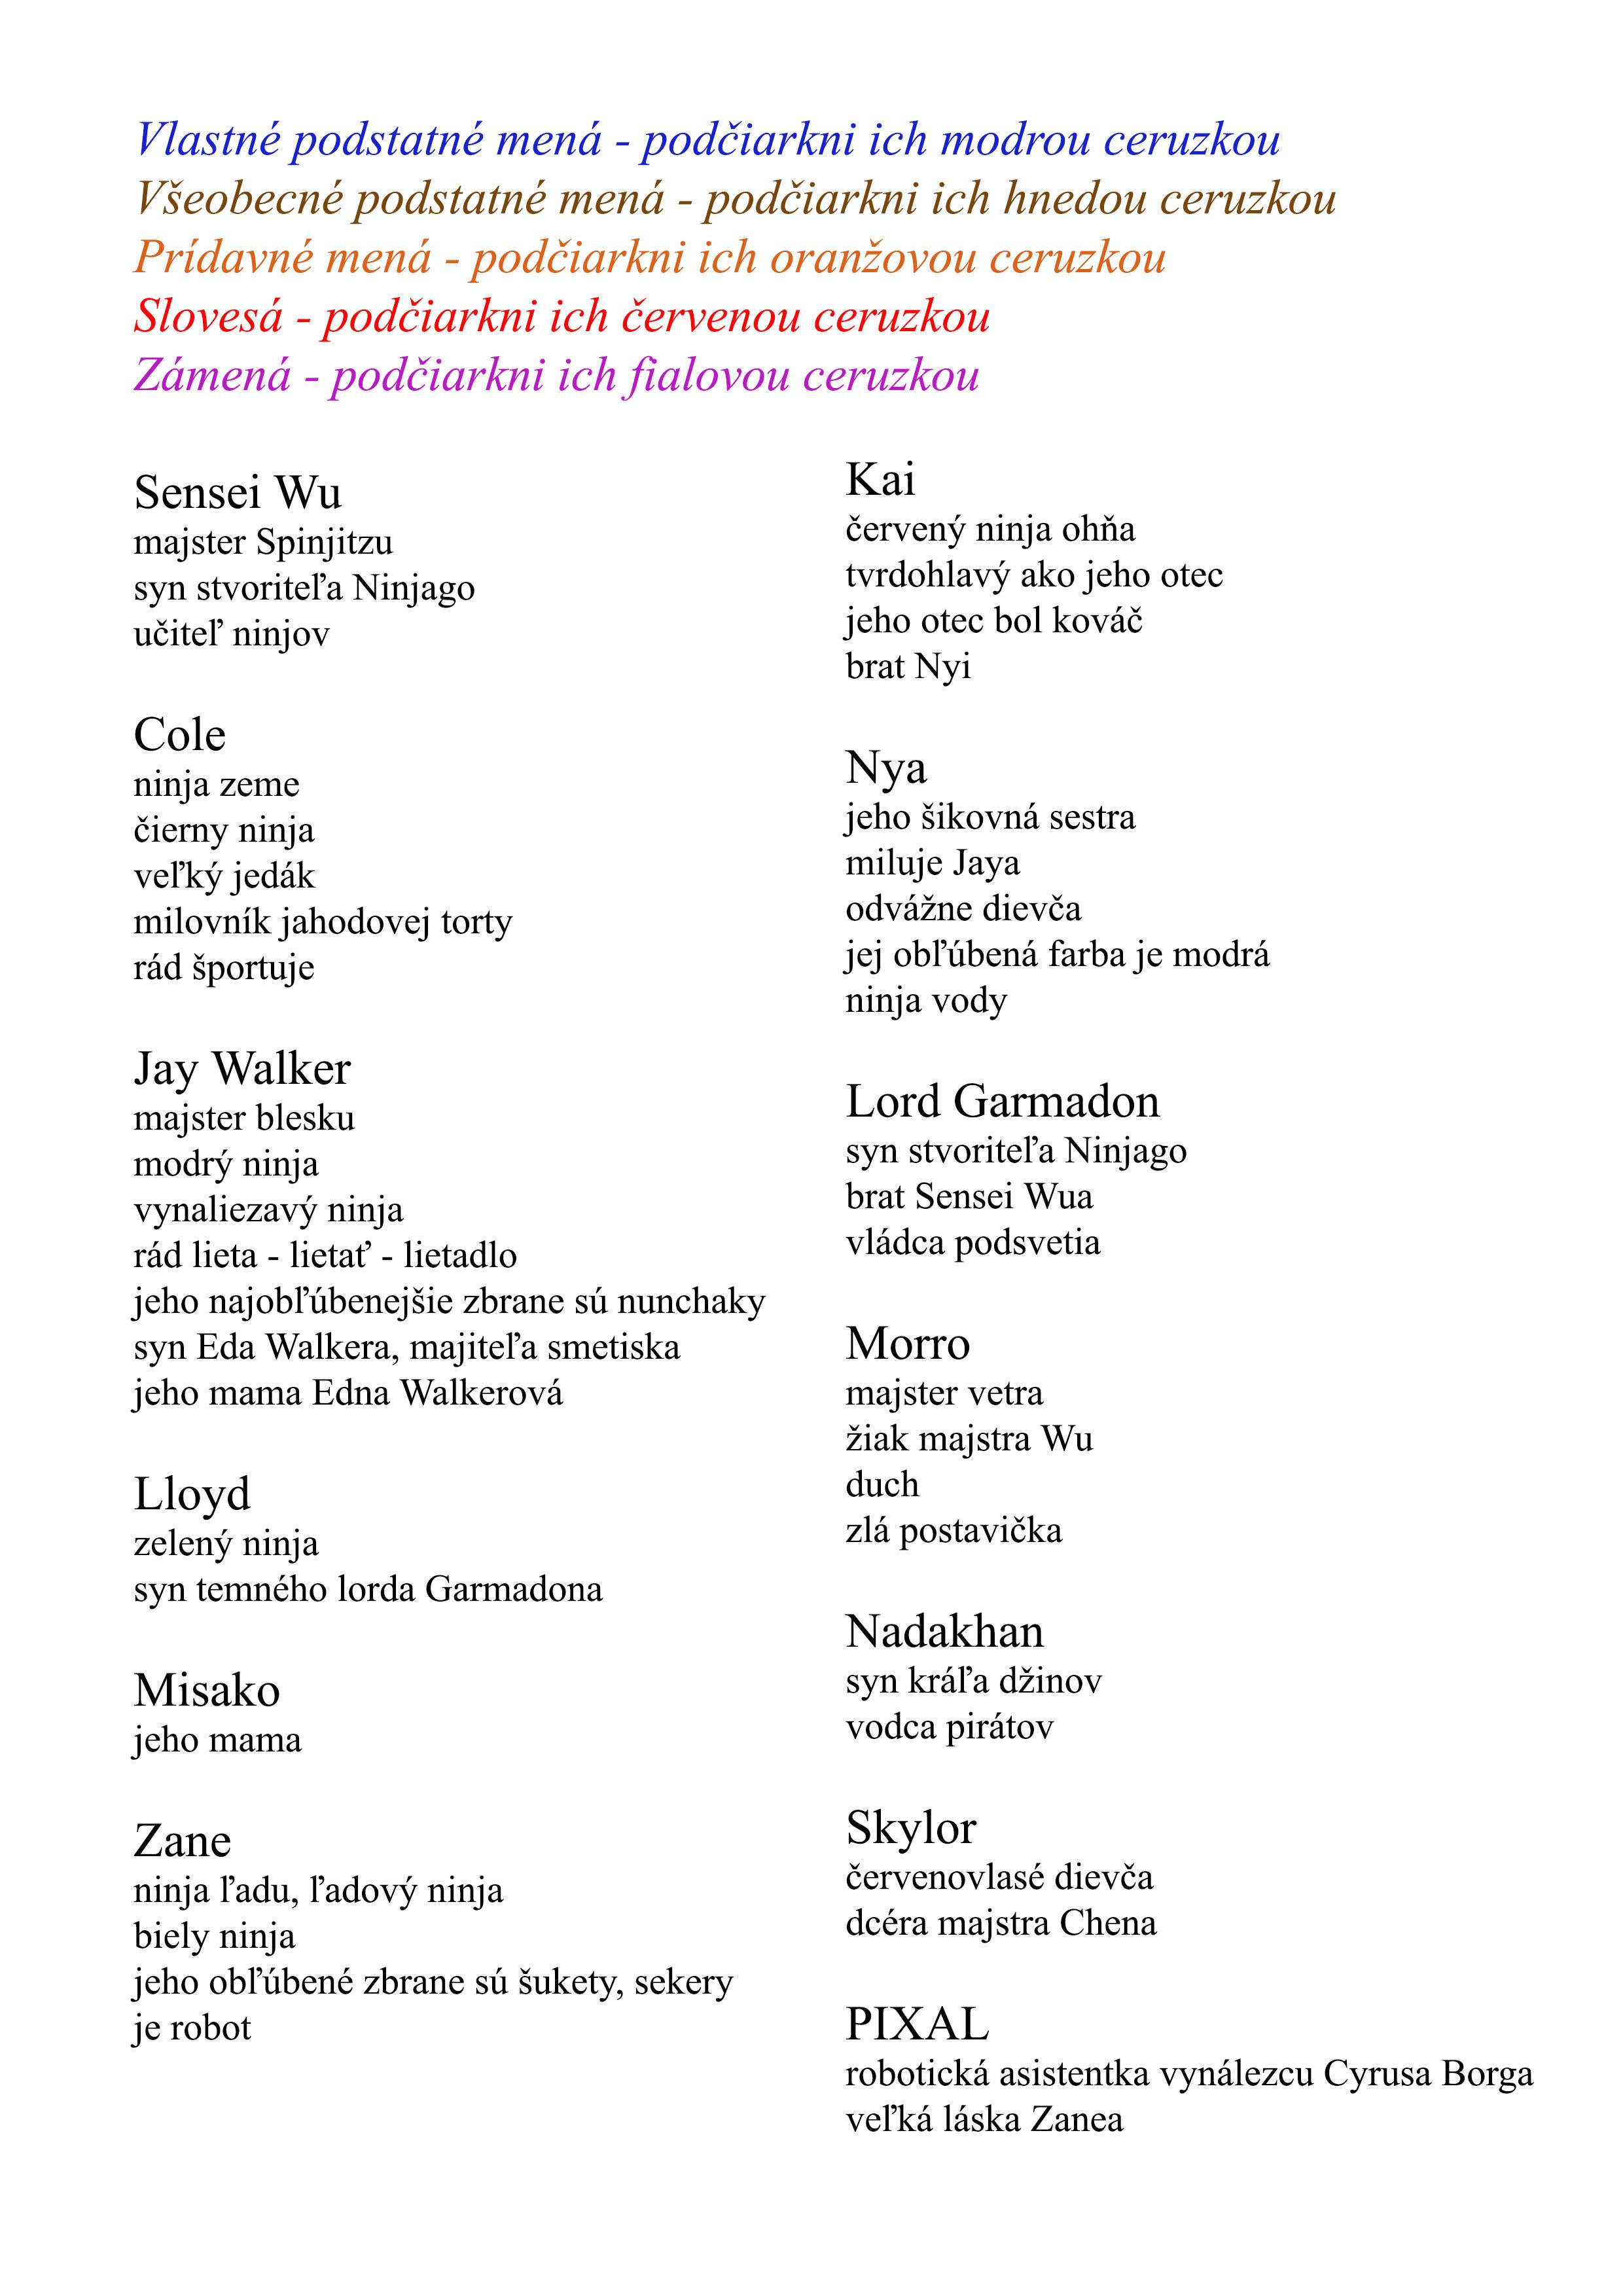 Ninjago Slovne druhy - slovensky jazyk 3 rocnik